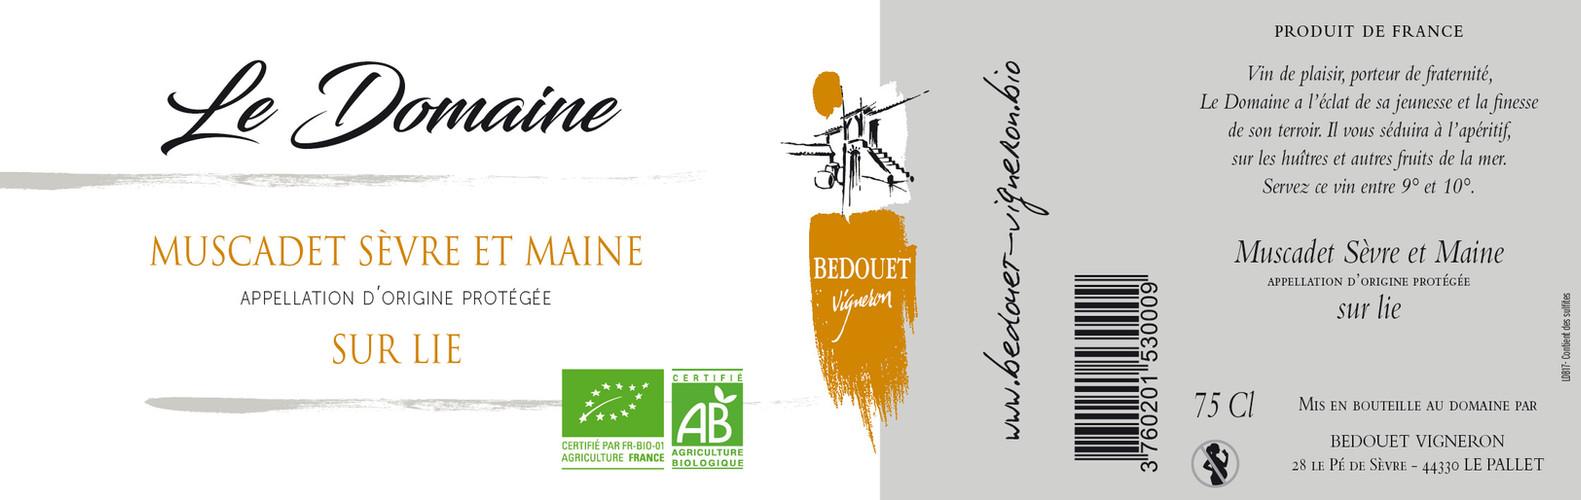 Le Domaine Bedouet vigneron BIO